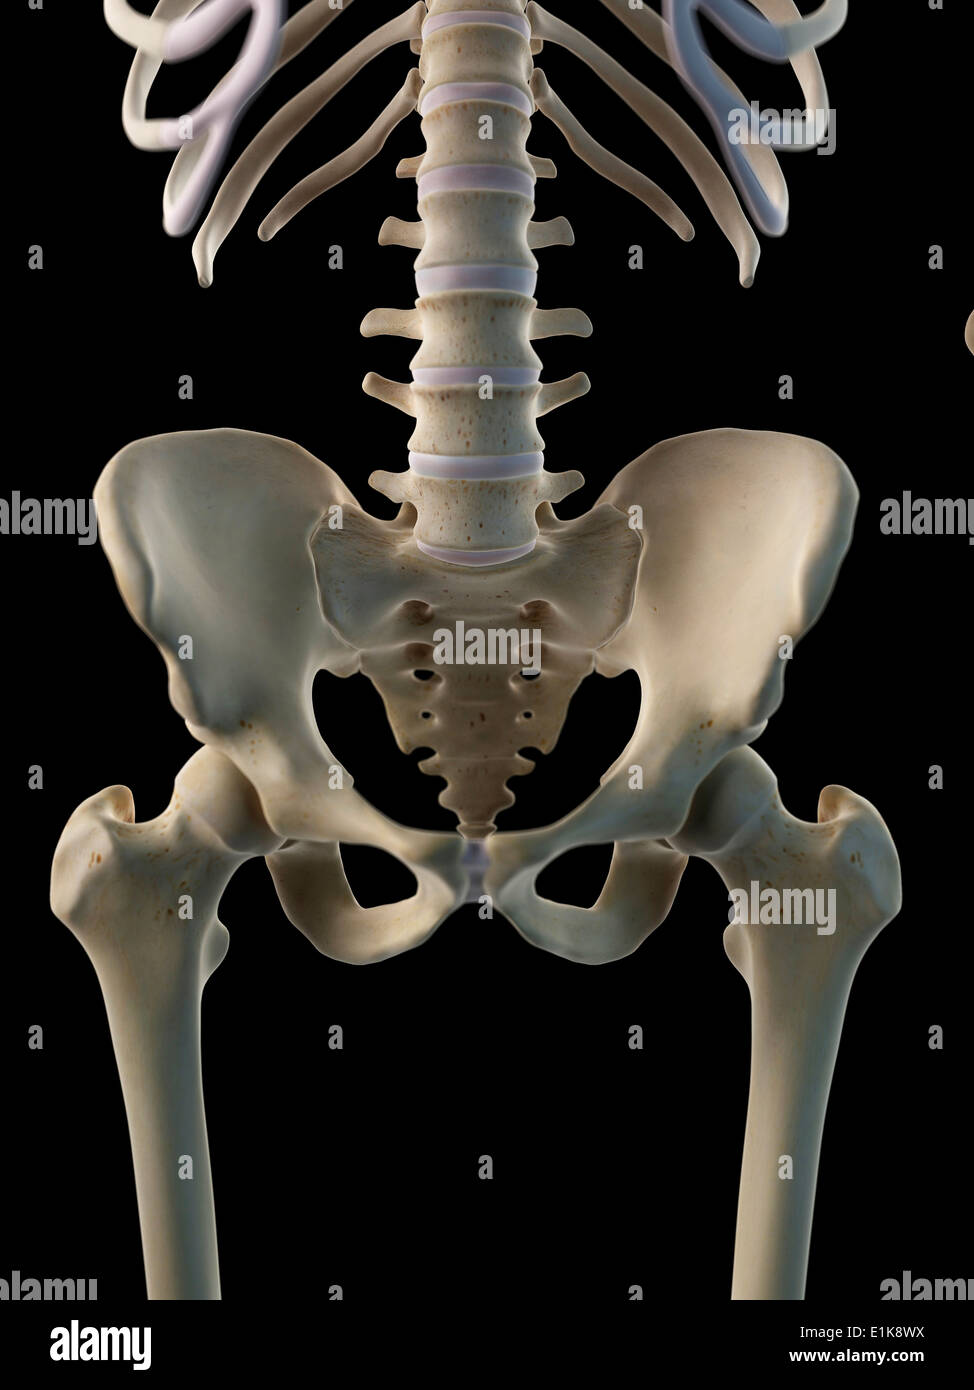 Human Hip Bone Computer Artwork Stock Photo 69880214 Alamy